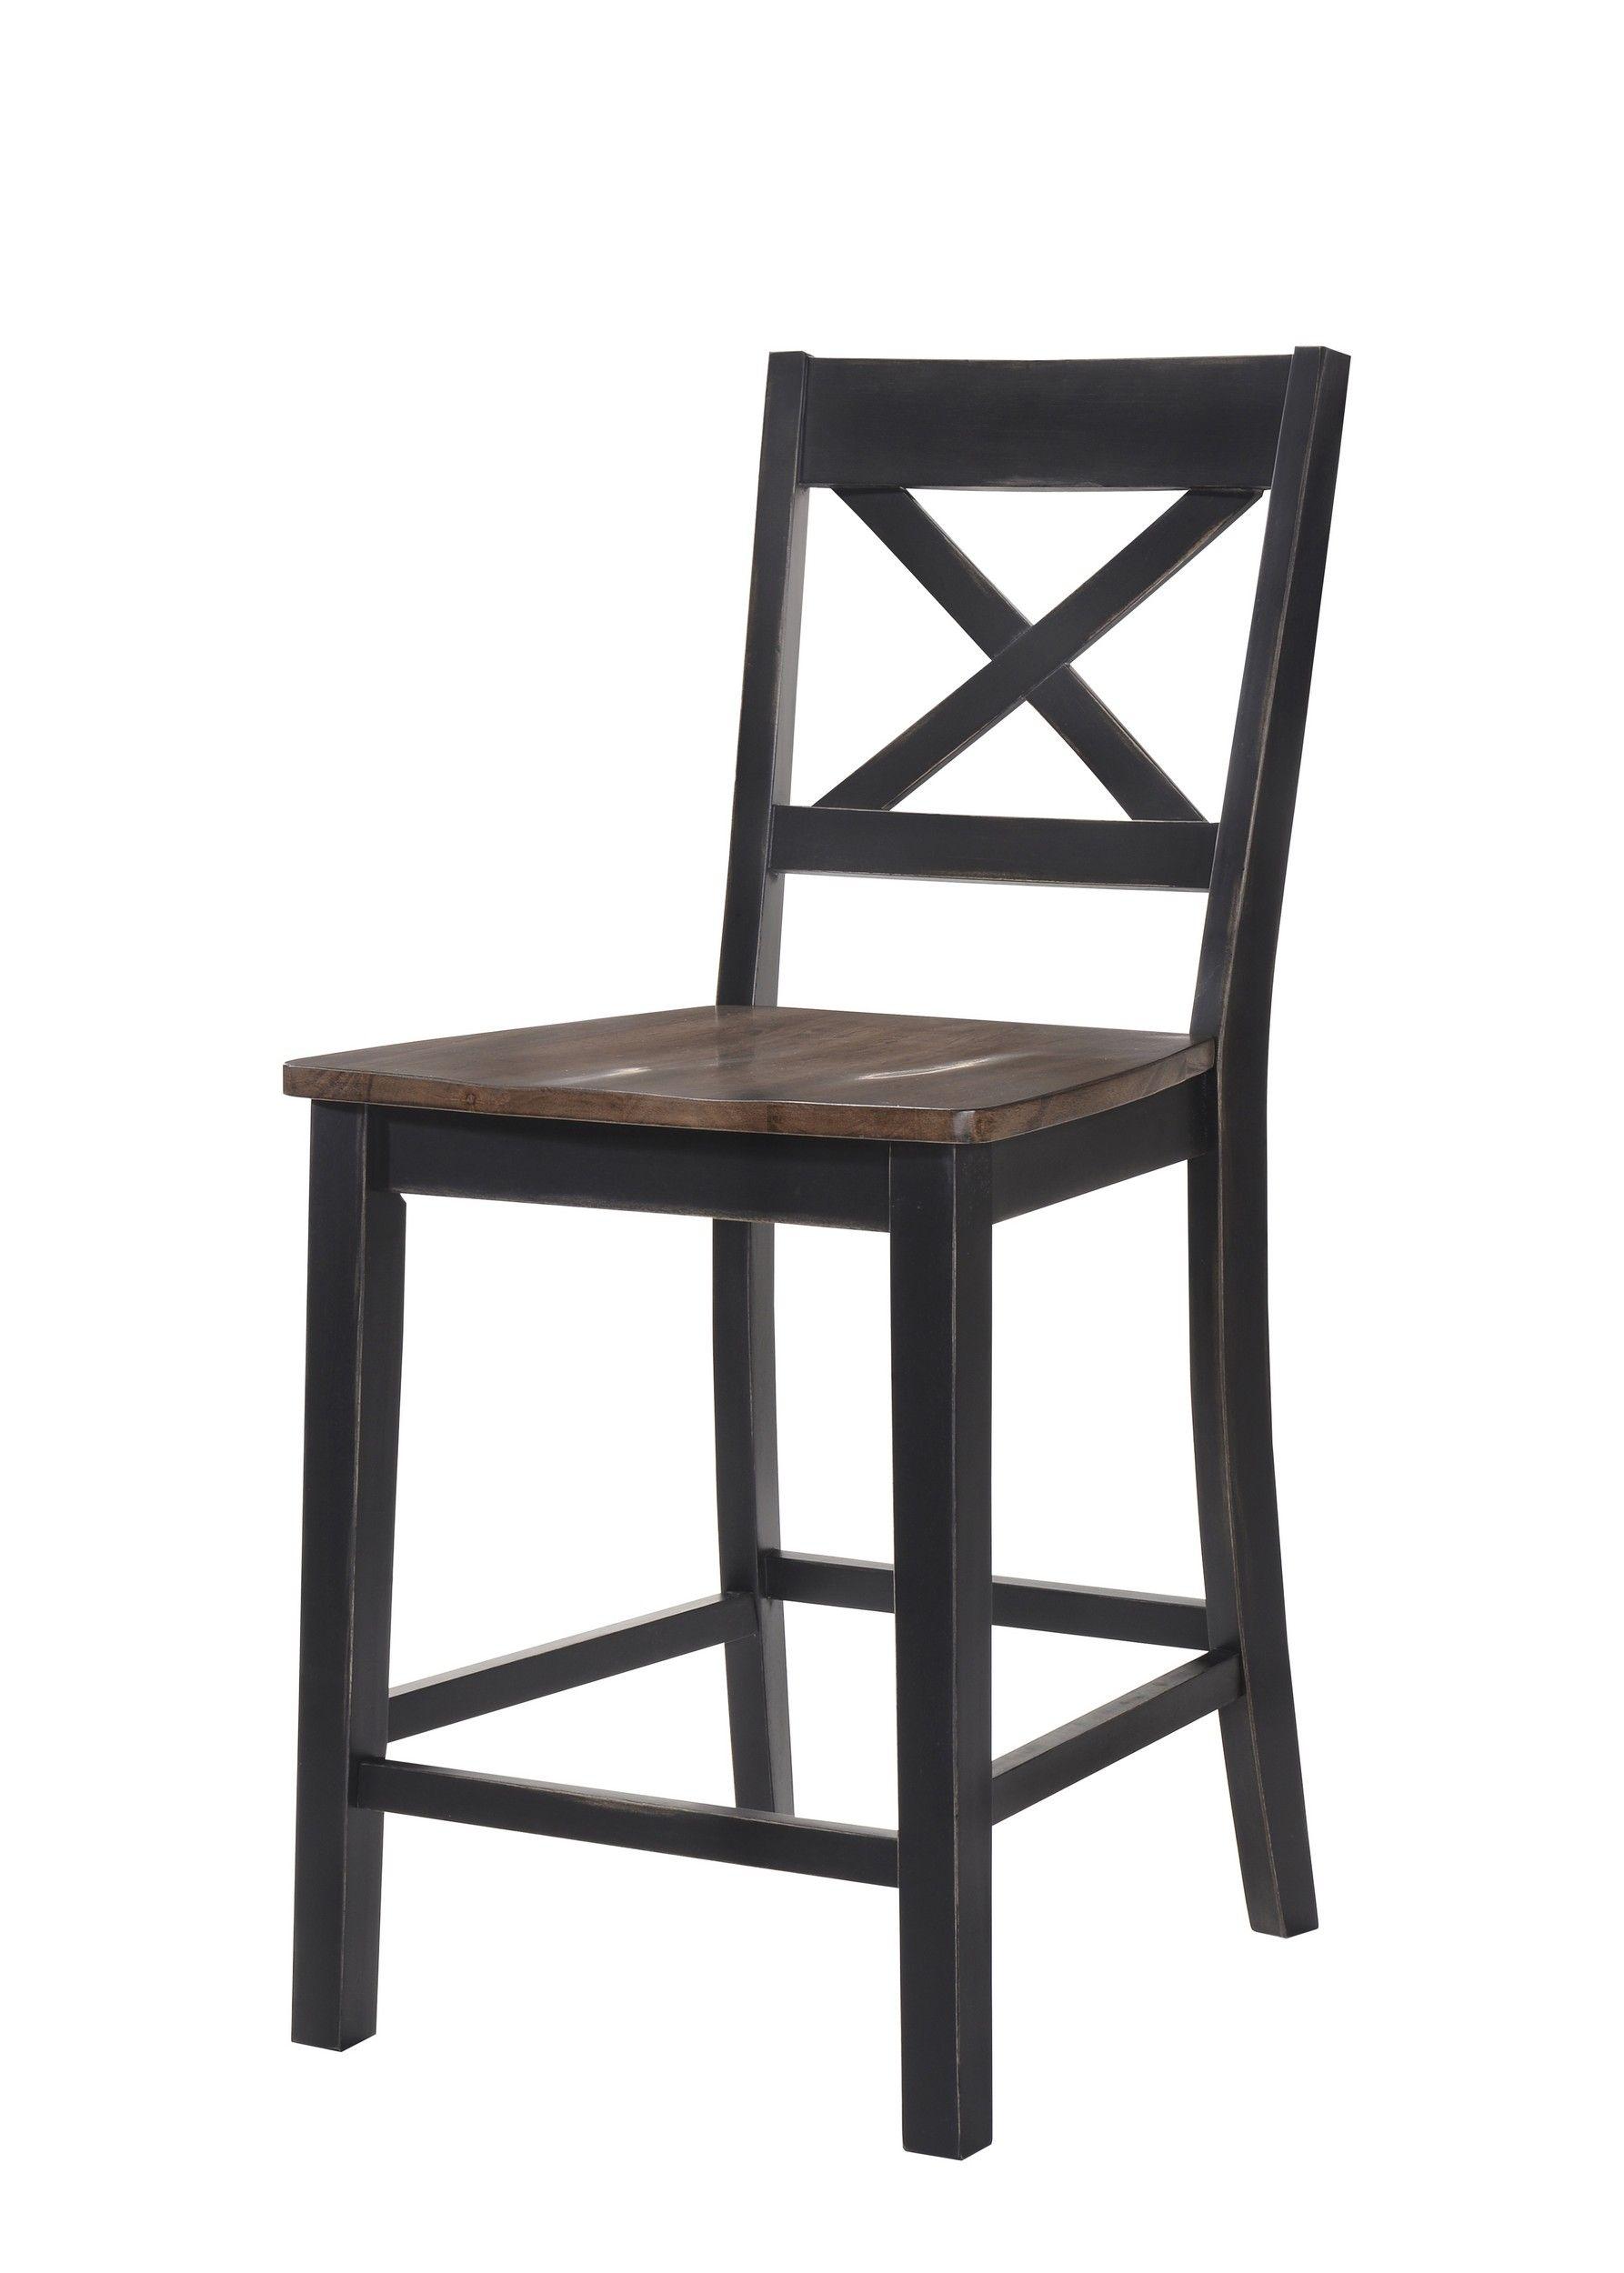 Awe Inspiring Simmons Upholstery 5058 55 2 Hot Sellers Bar Stools Inzonedesignstudio Interior Chair Design Inzonedesignstudiocom